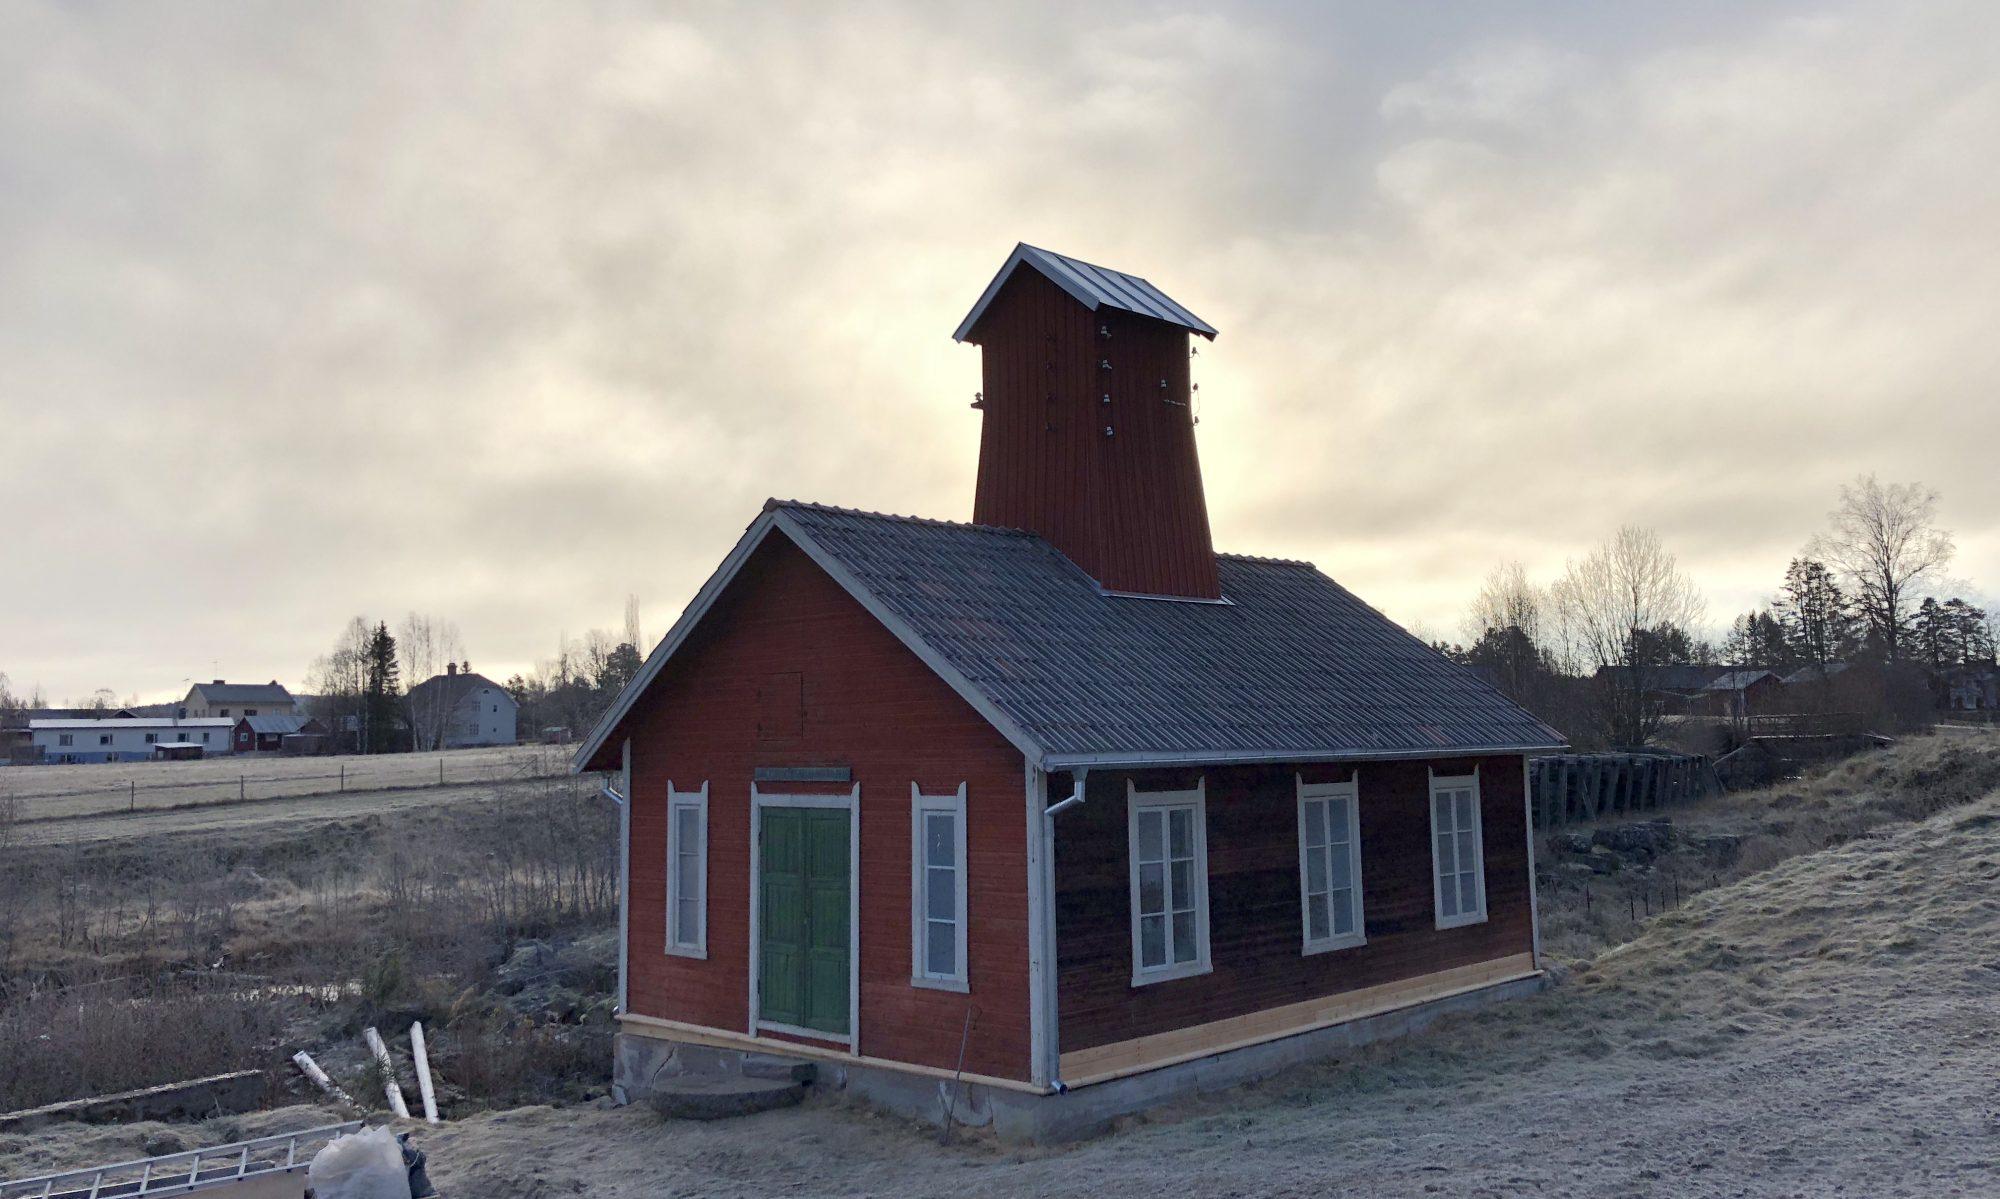 Stocksbo-Åbo-Brinnasen byalag